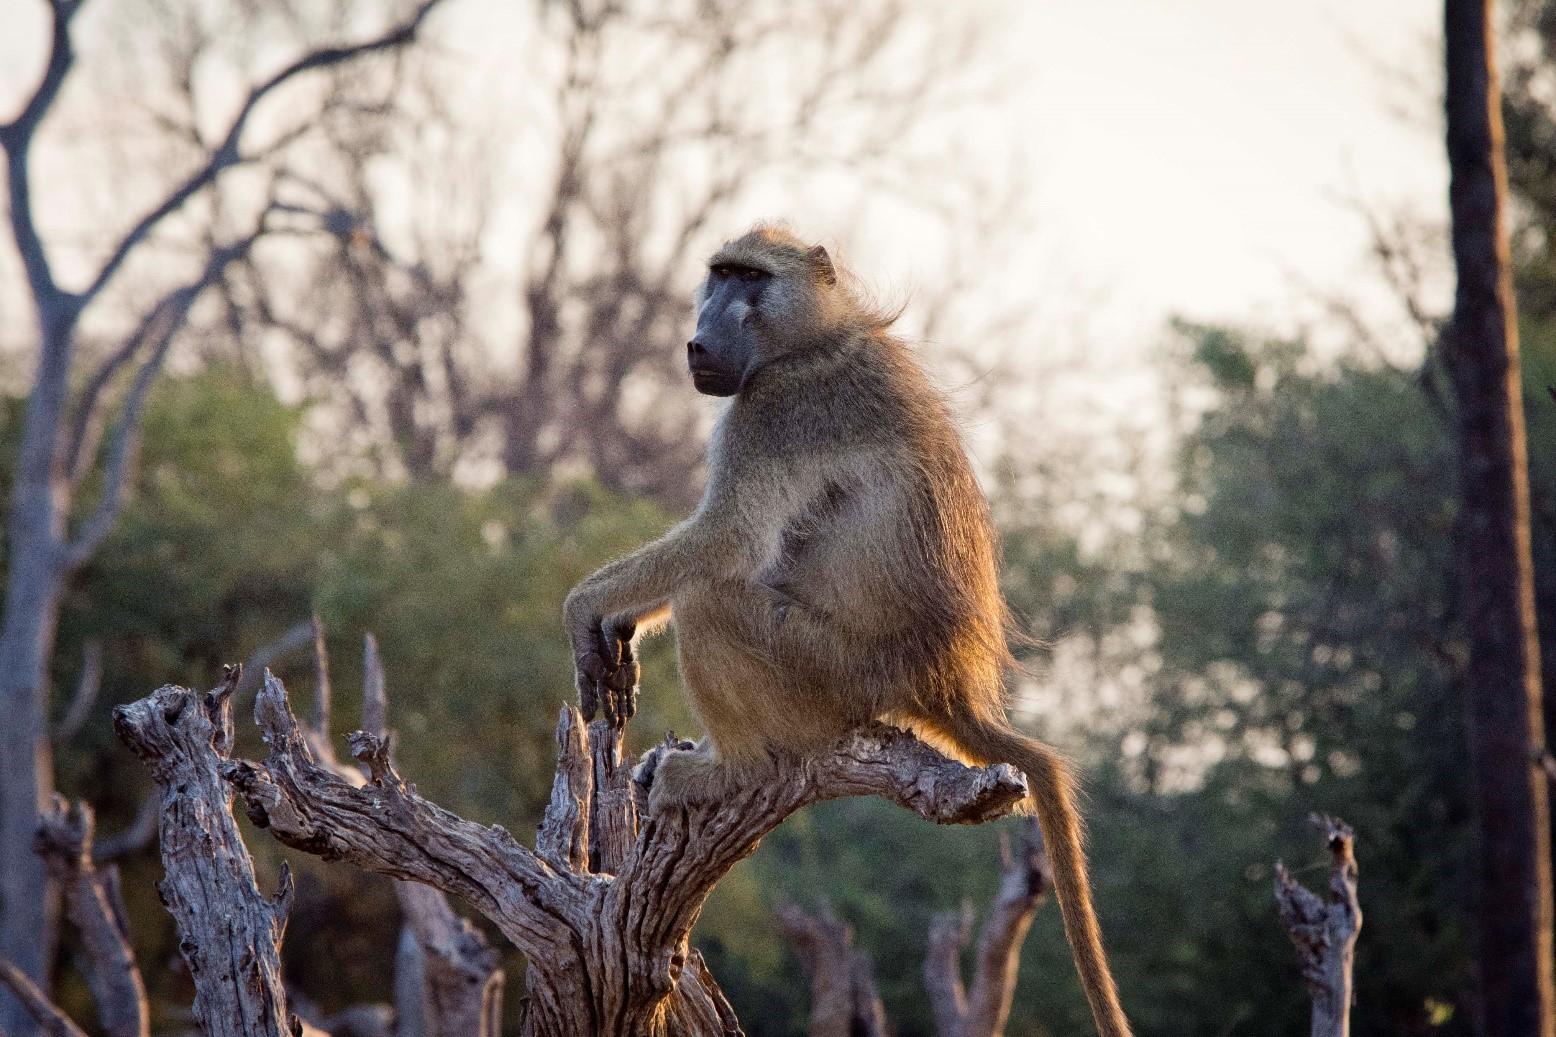 pic 2 monkey.jpg